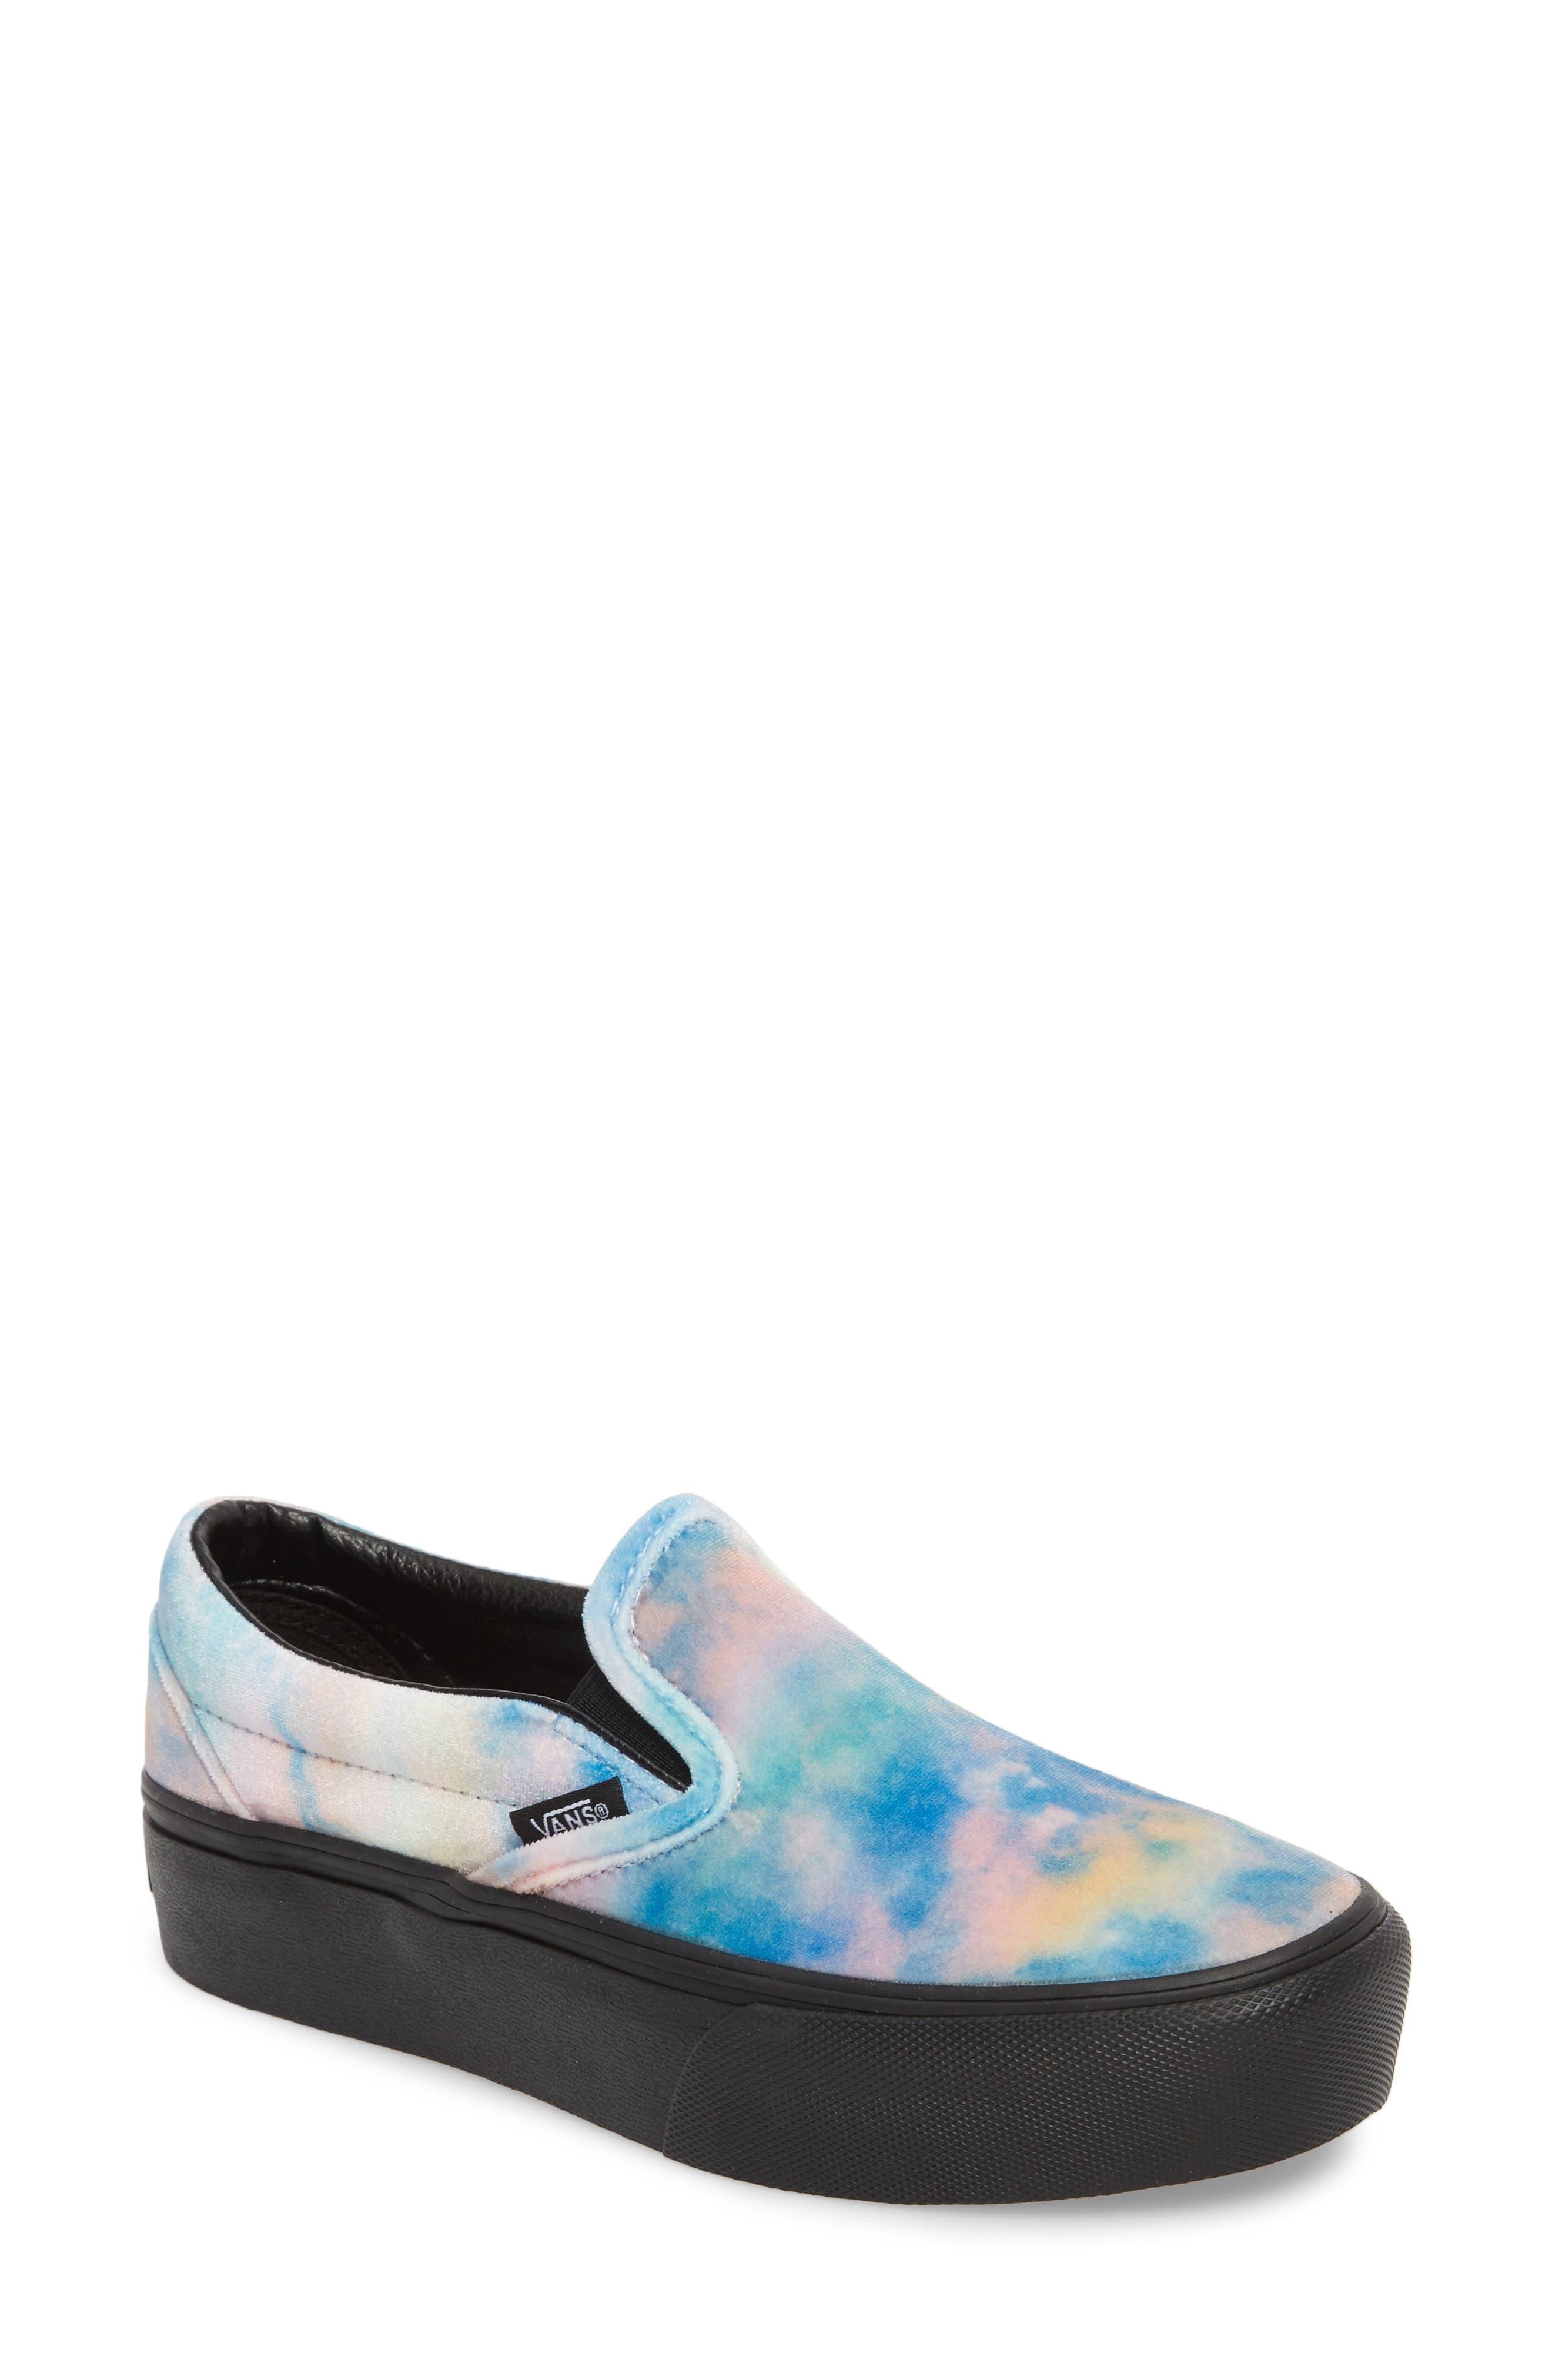 bc354ba0256 VANS Platform Slip-On Sneaker